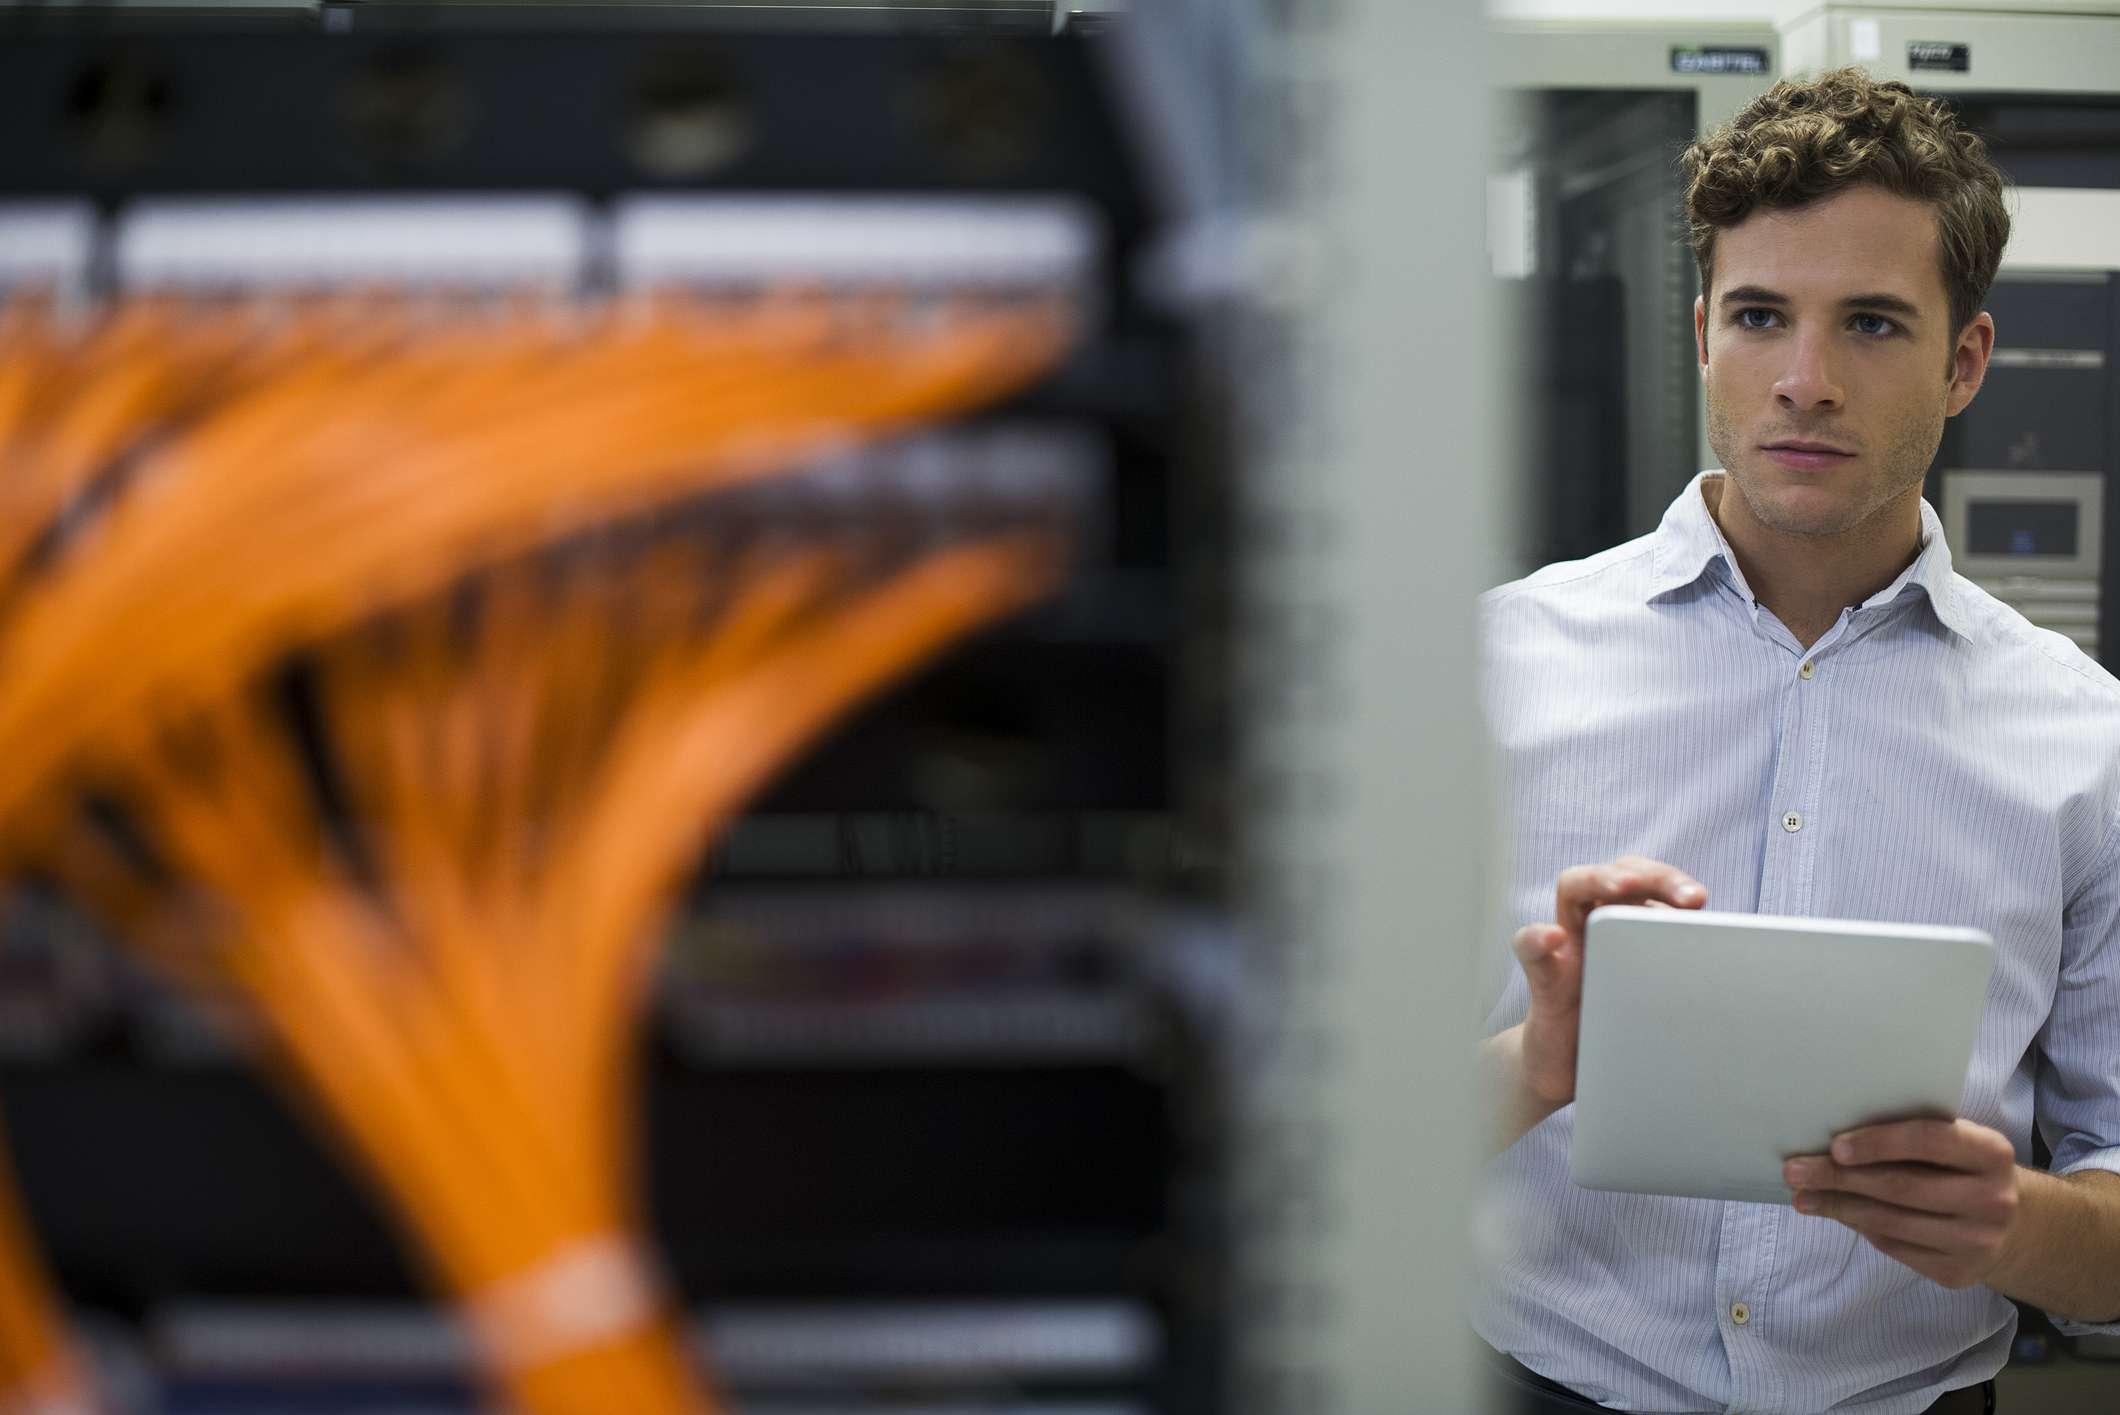 A man in a server rack